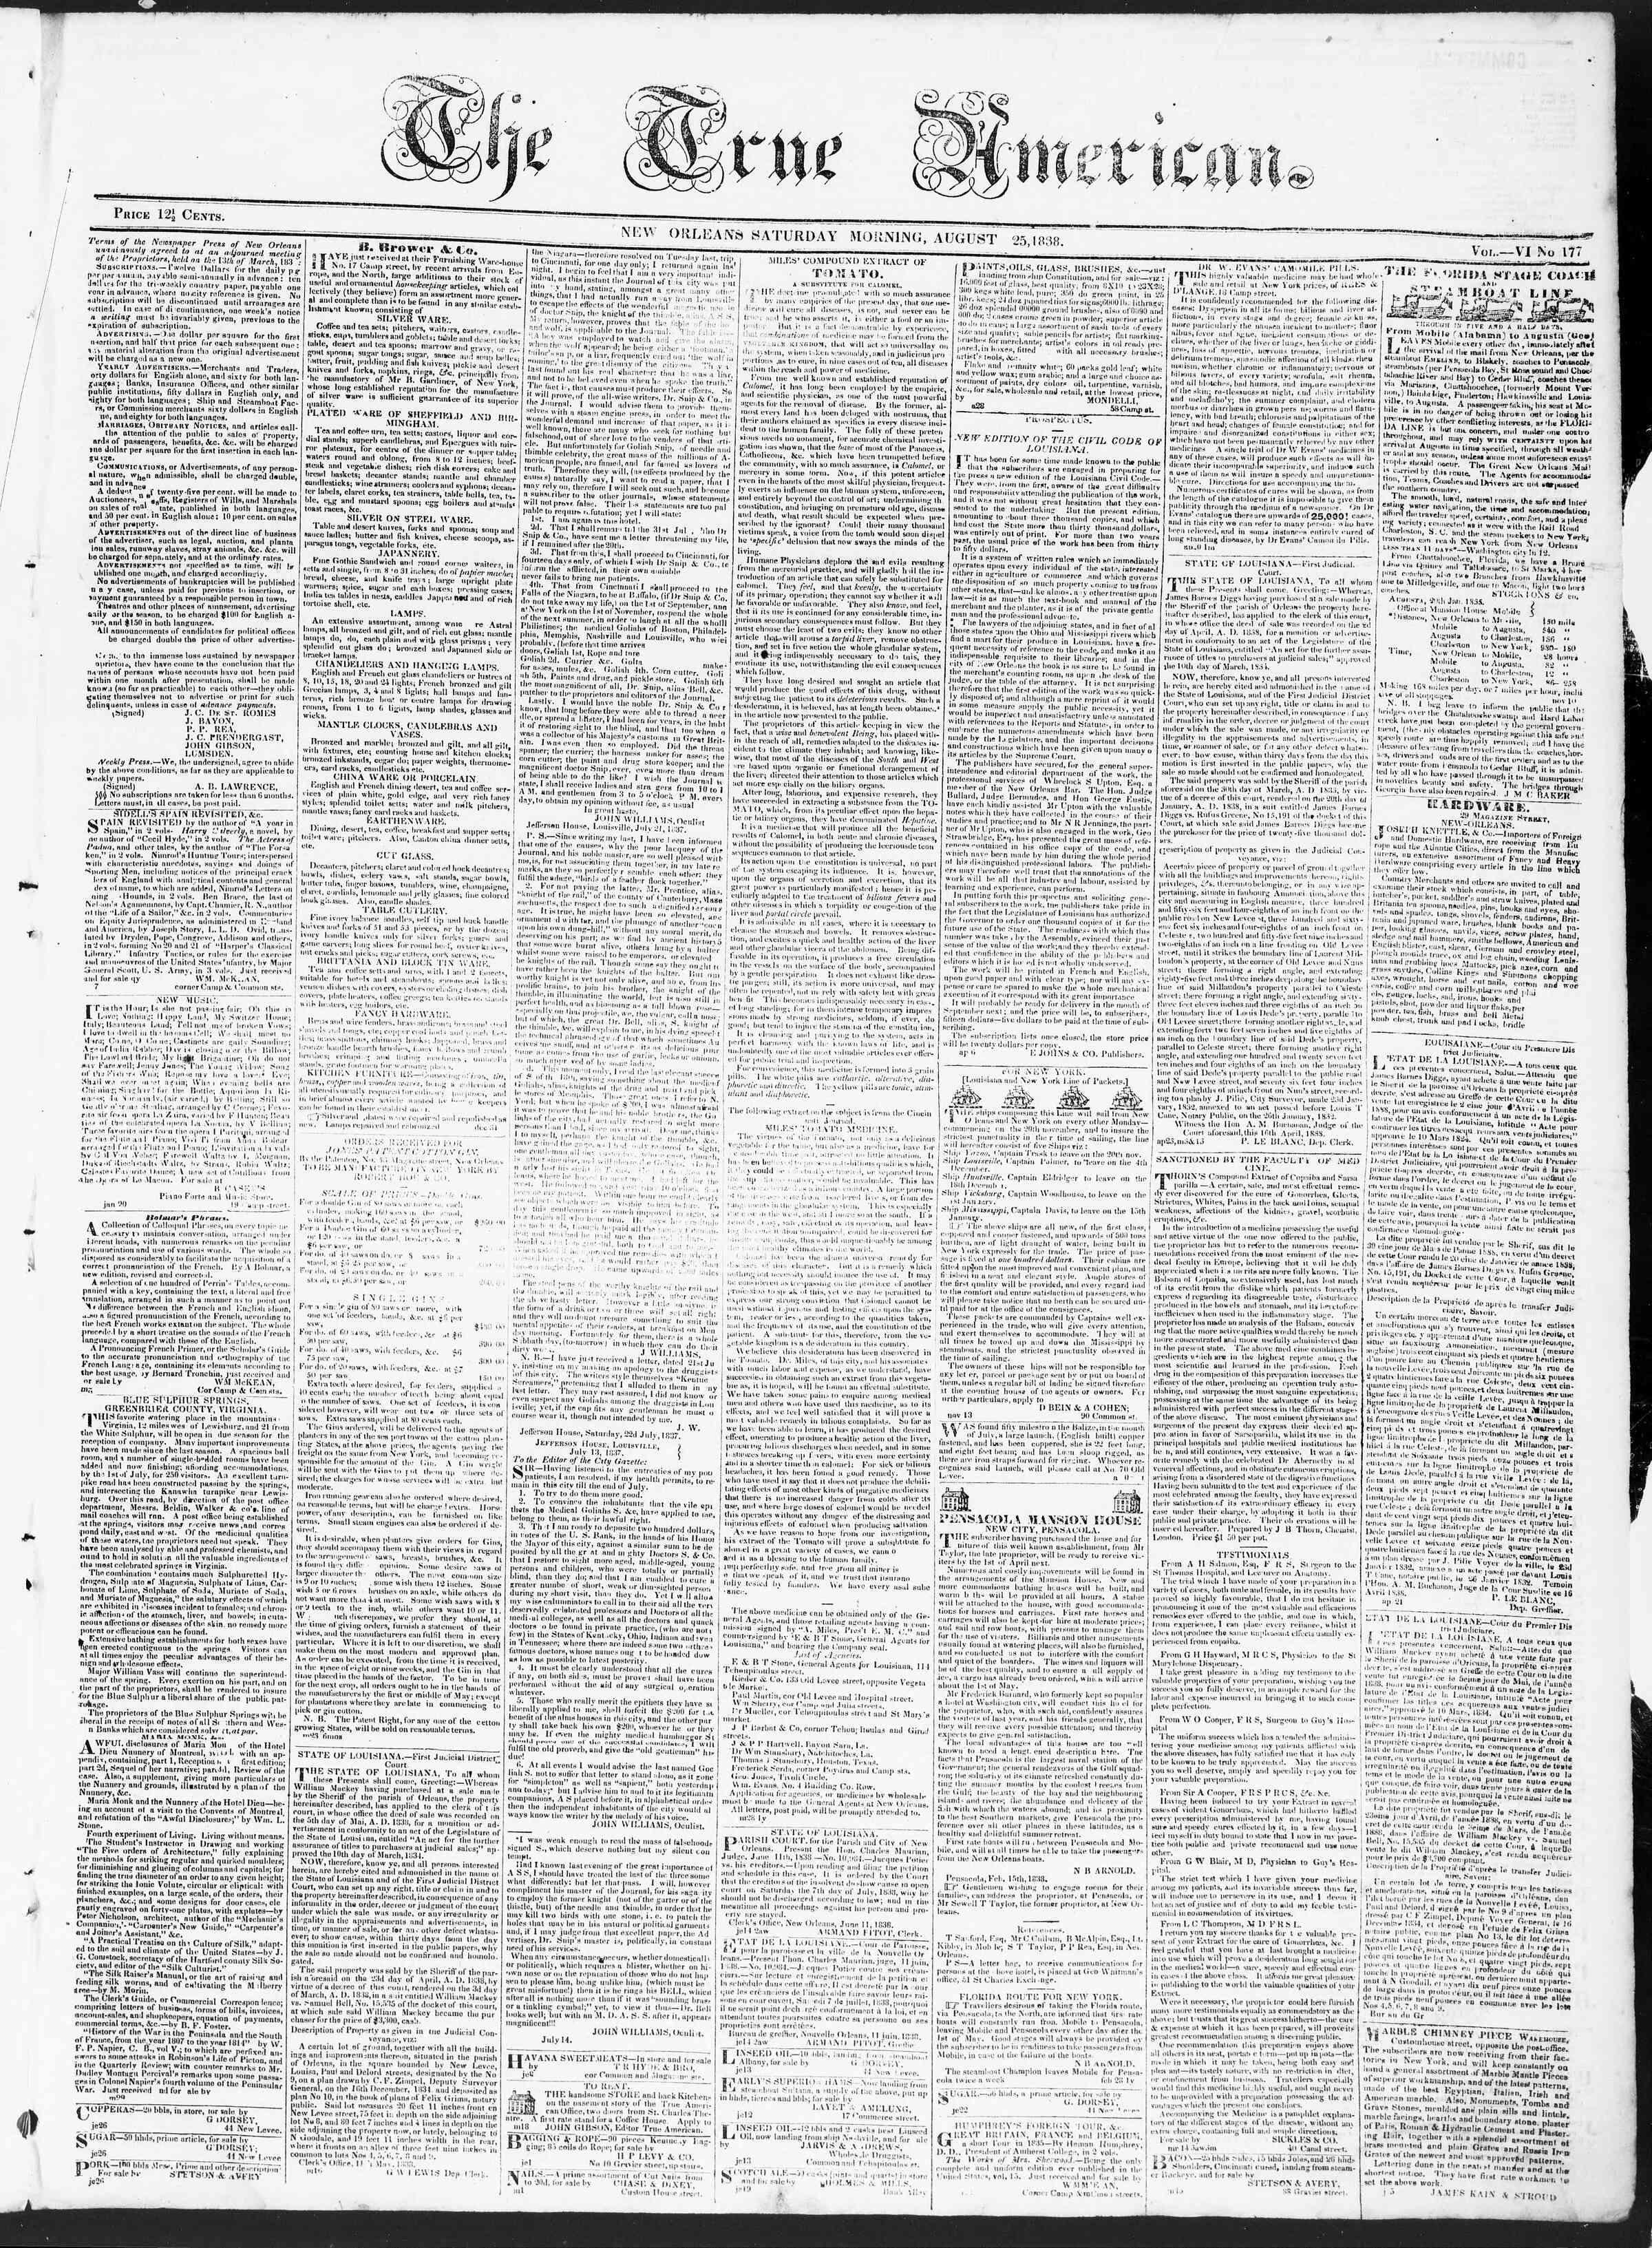 August 25, 1838 Tarihli True American Gazetesi Sayfa 1